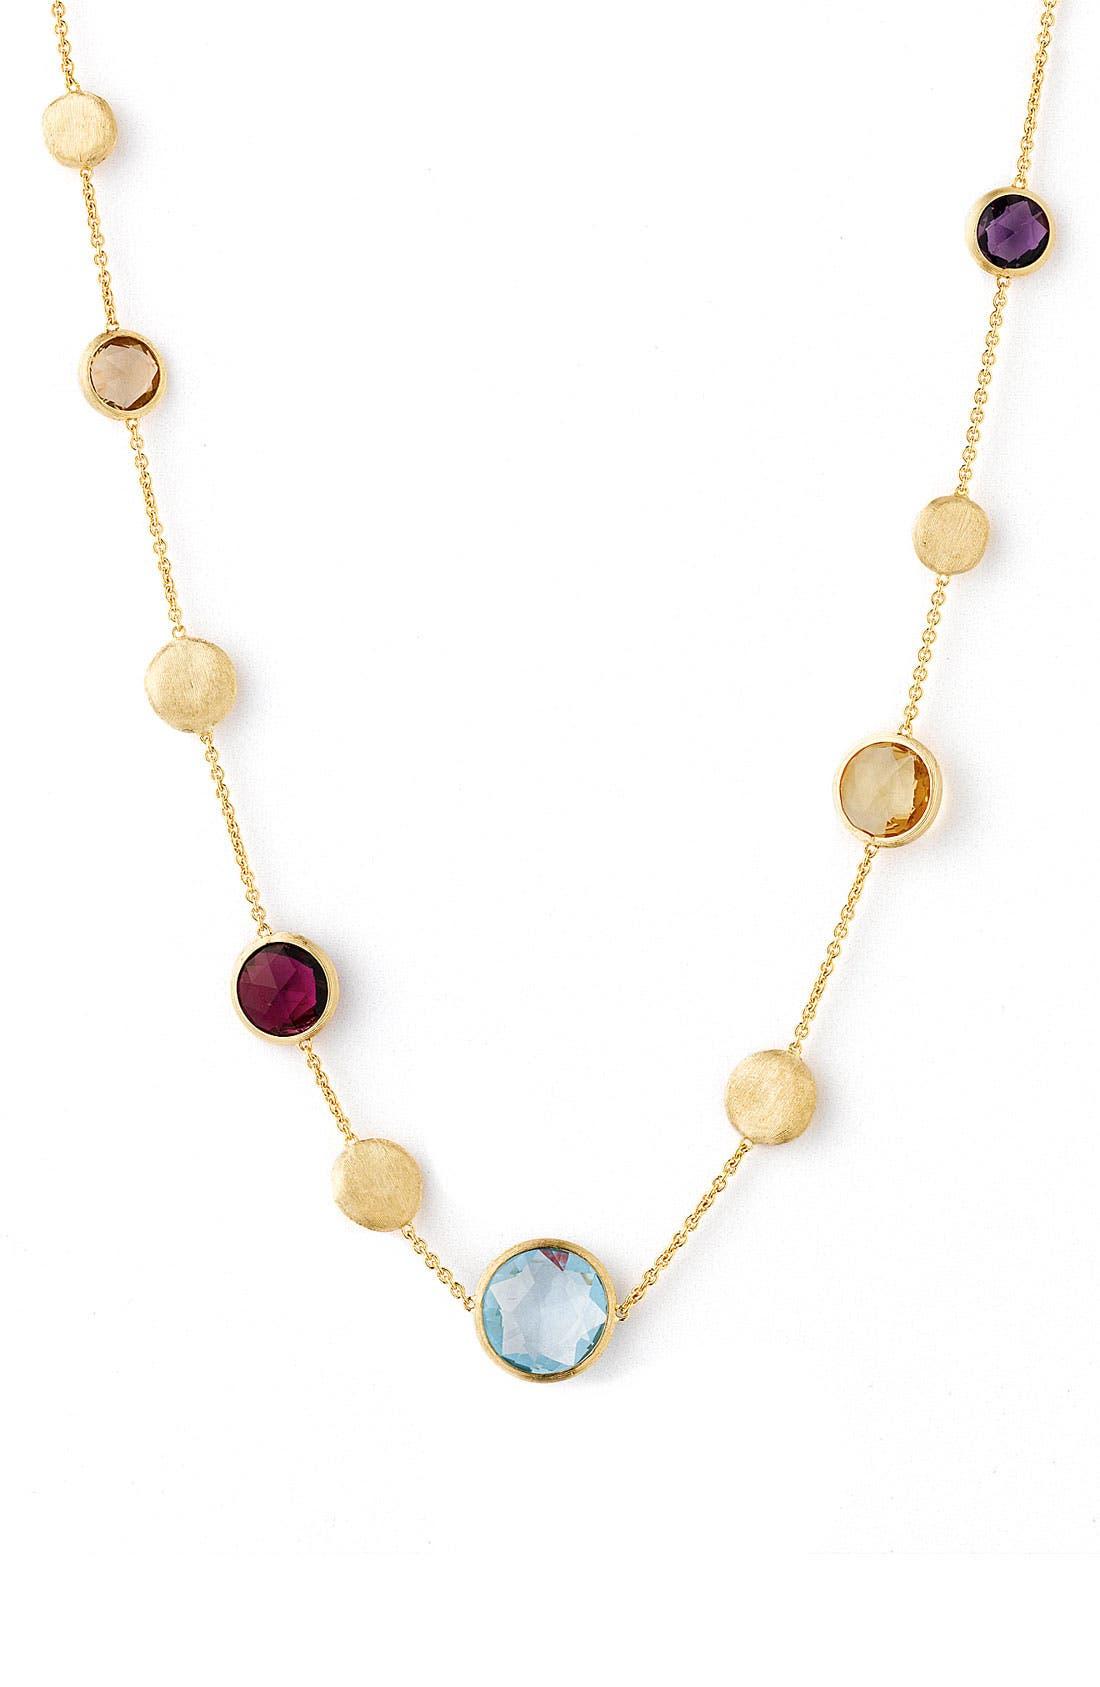 Alternate Image 1 Selected - Marco Bicego 'Jaipur' Single Strand Semiprecious Necklace